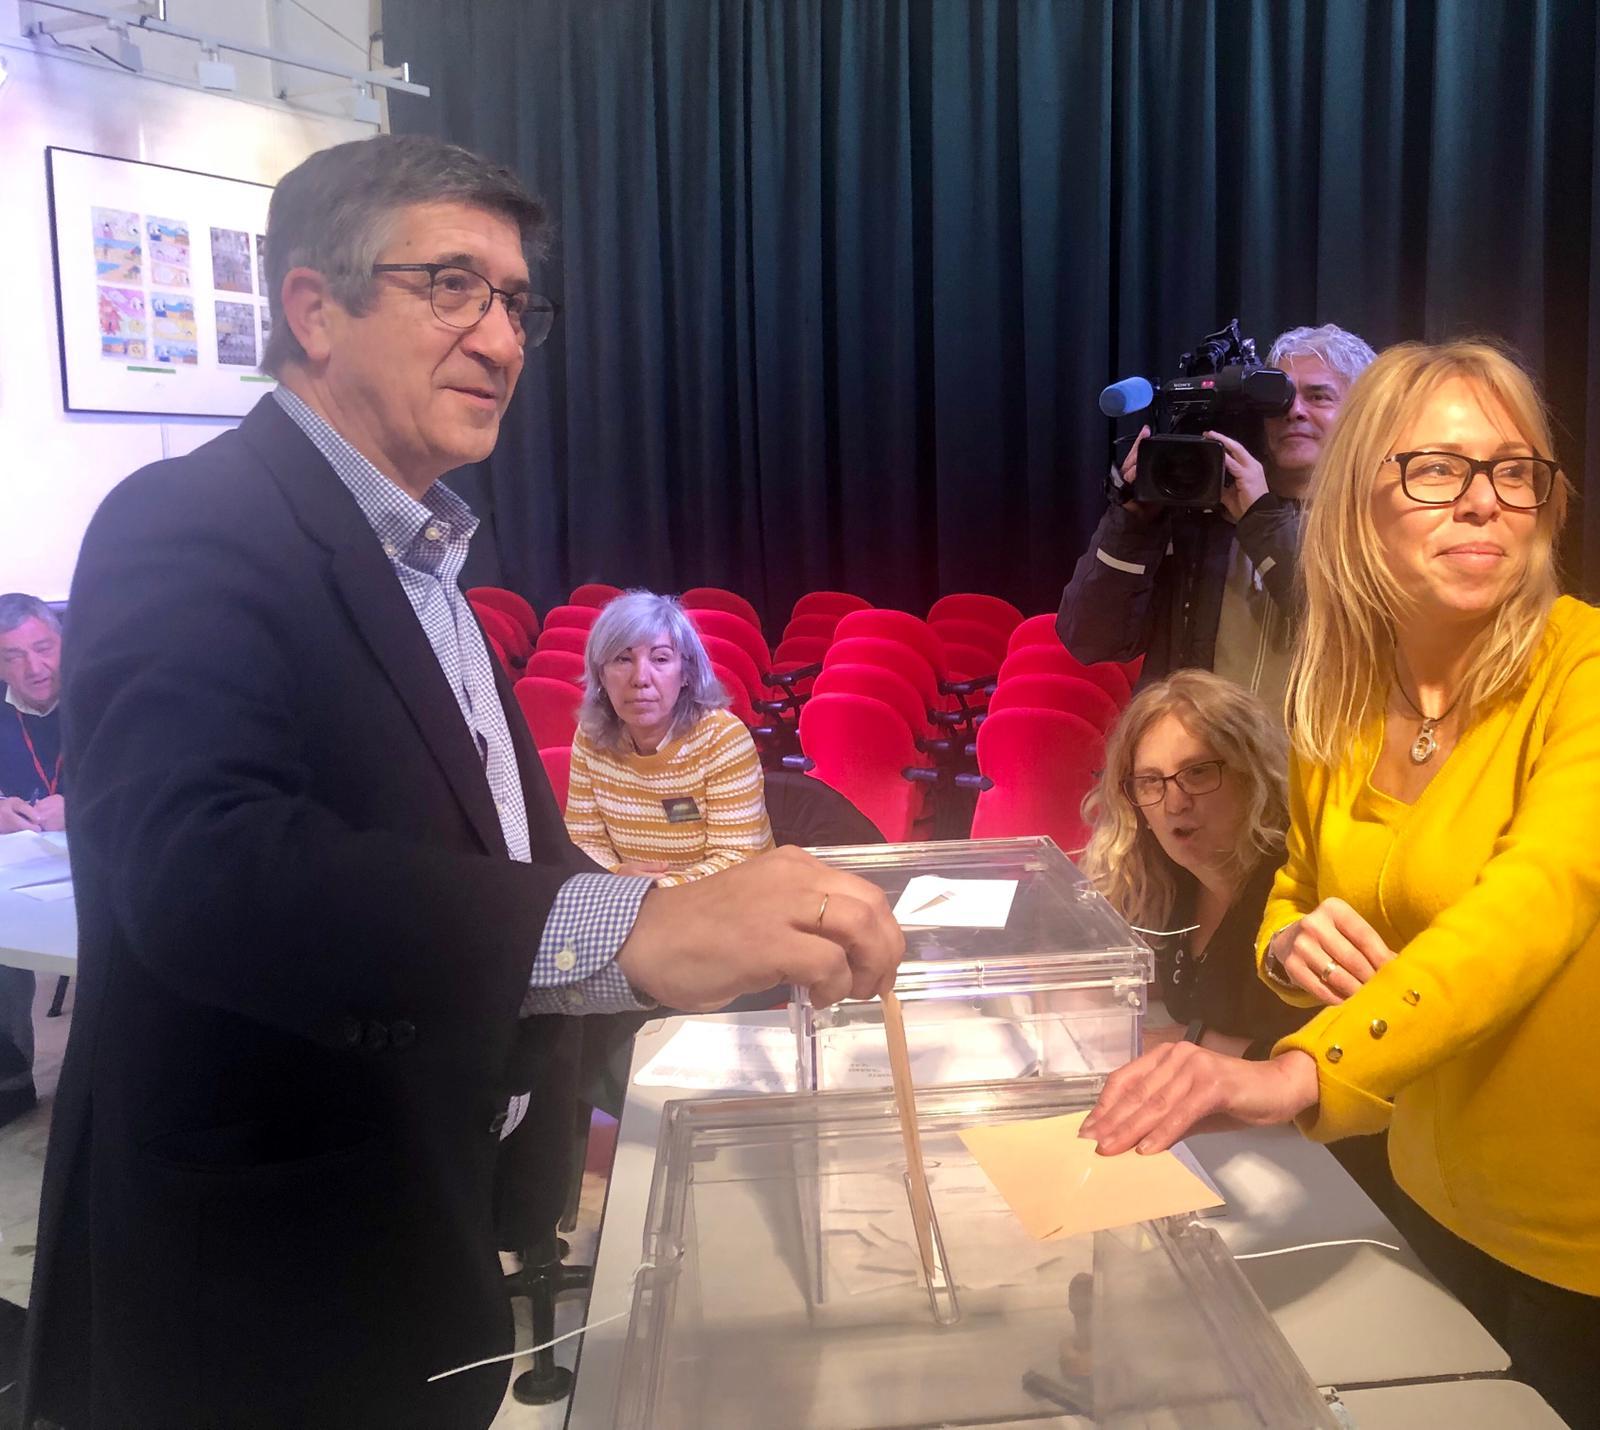 Jornada de votación con Patxi López